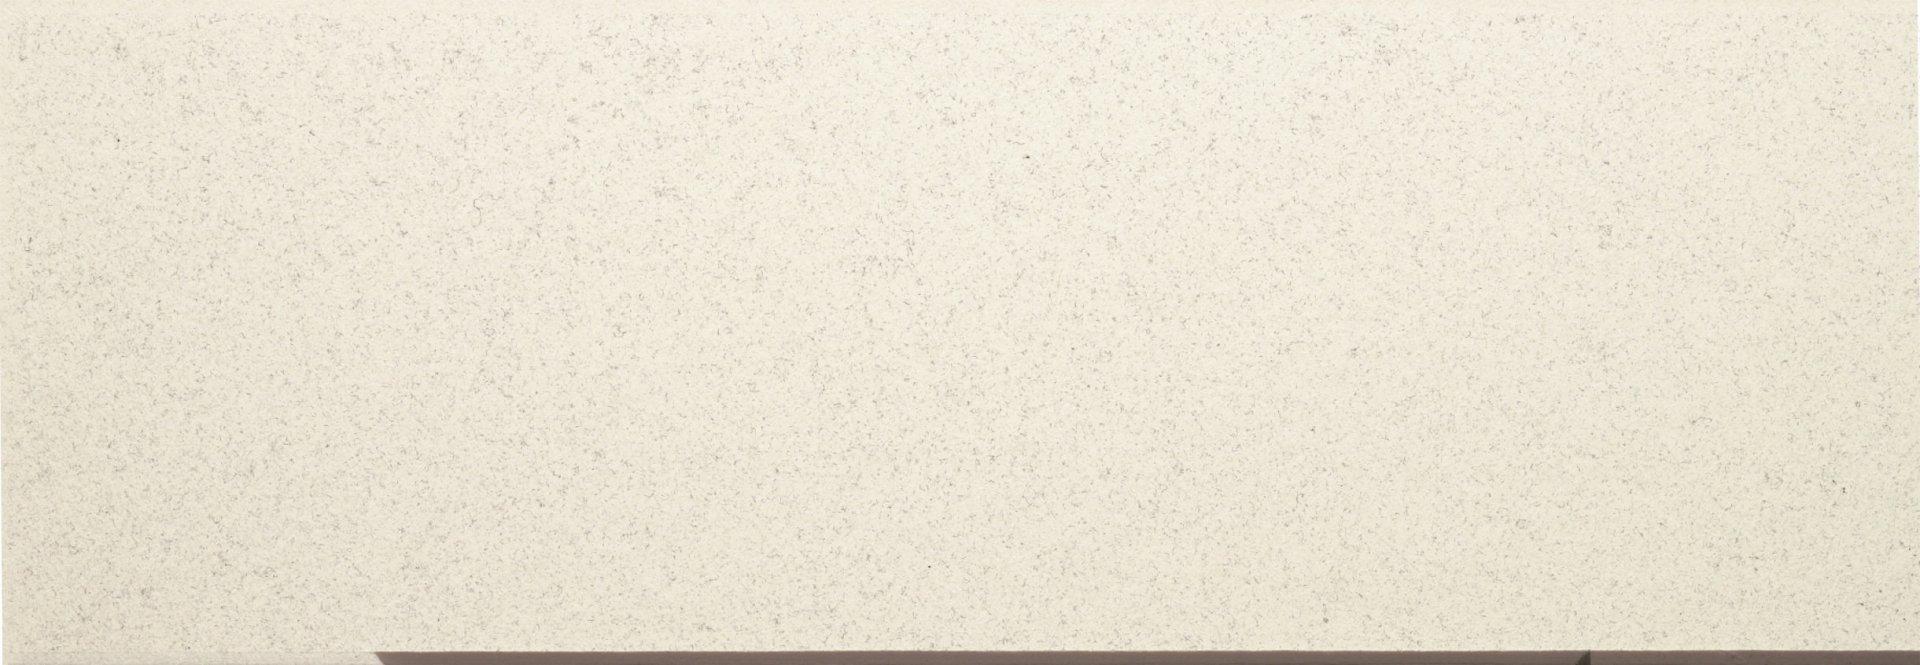 GSRM1027_G1027 Silver Gray